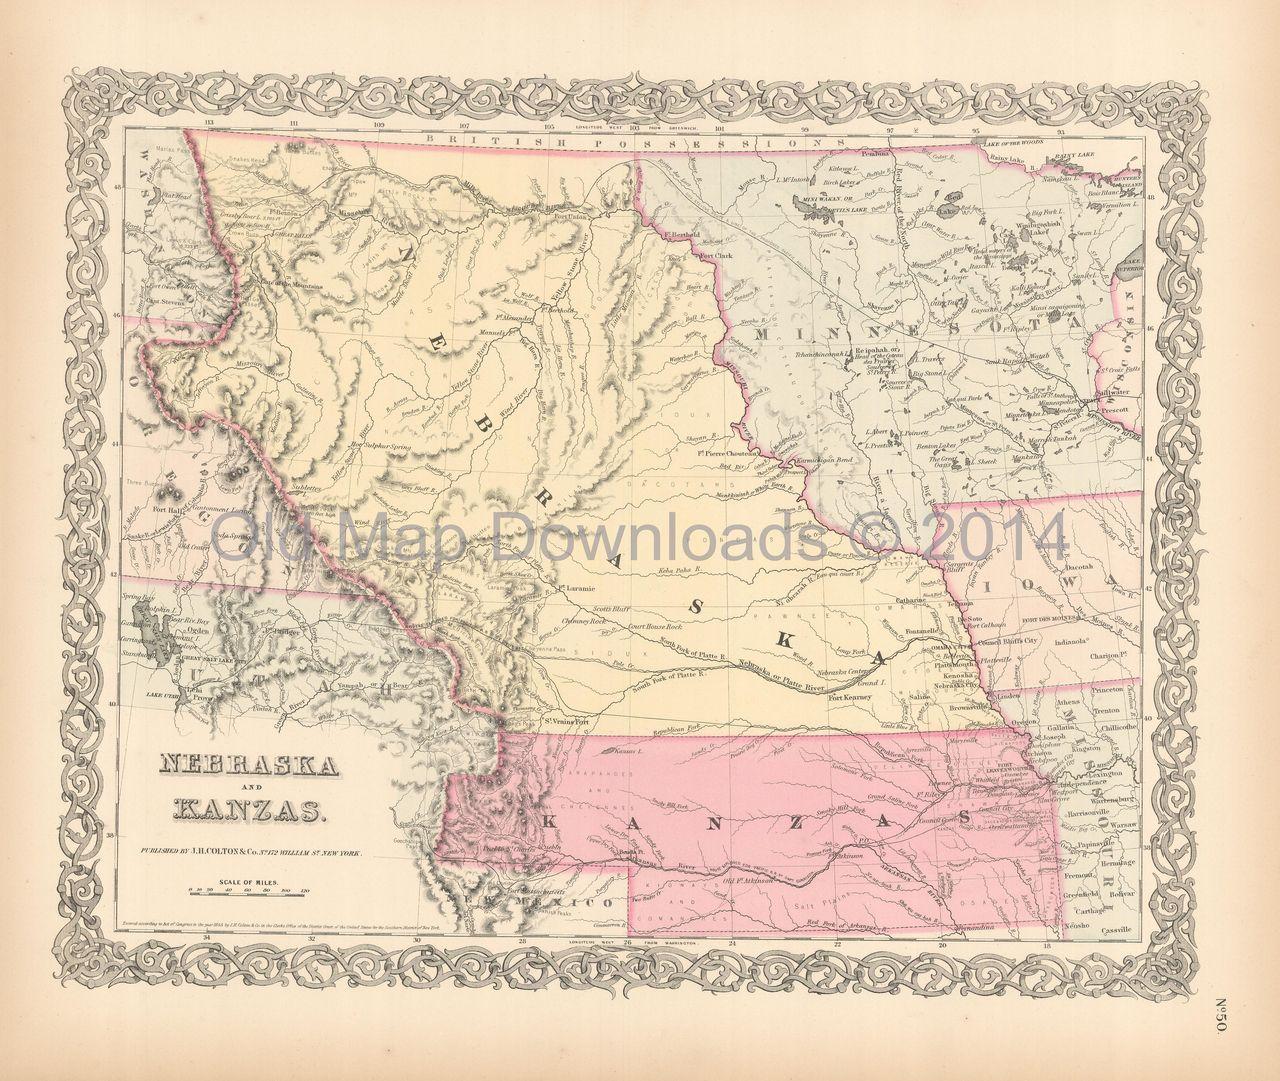 Nebraska Kansas Territory Old Map Colton 1855 Digital Image Scan ...